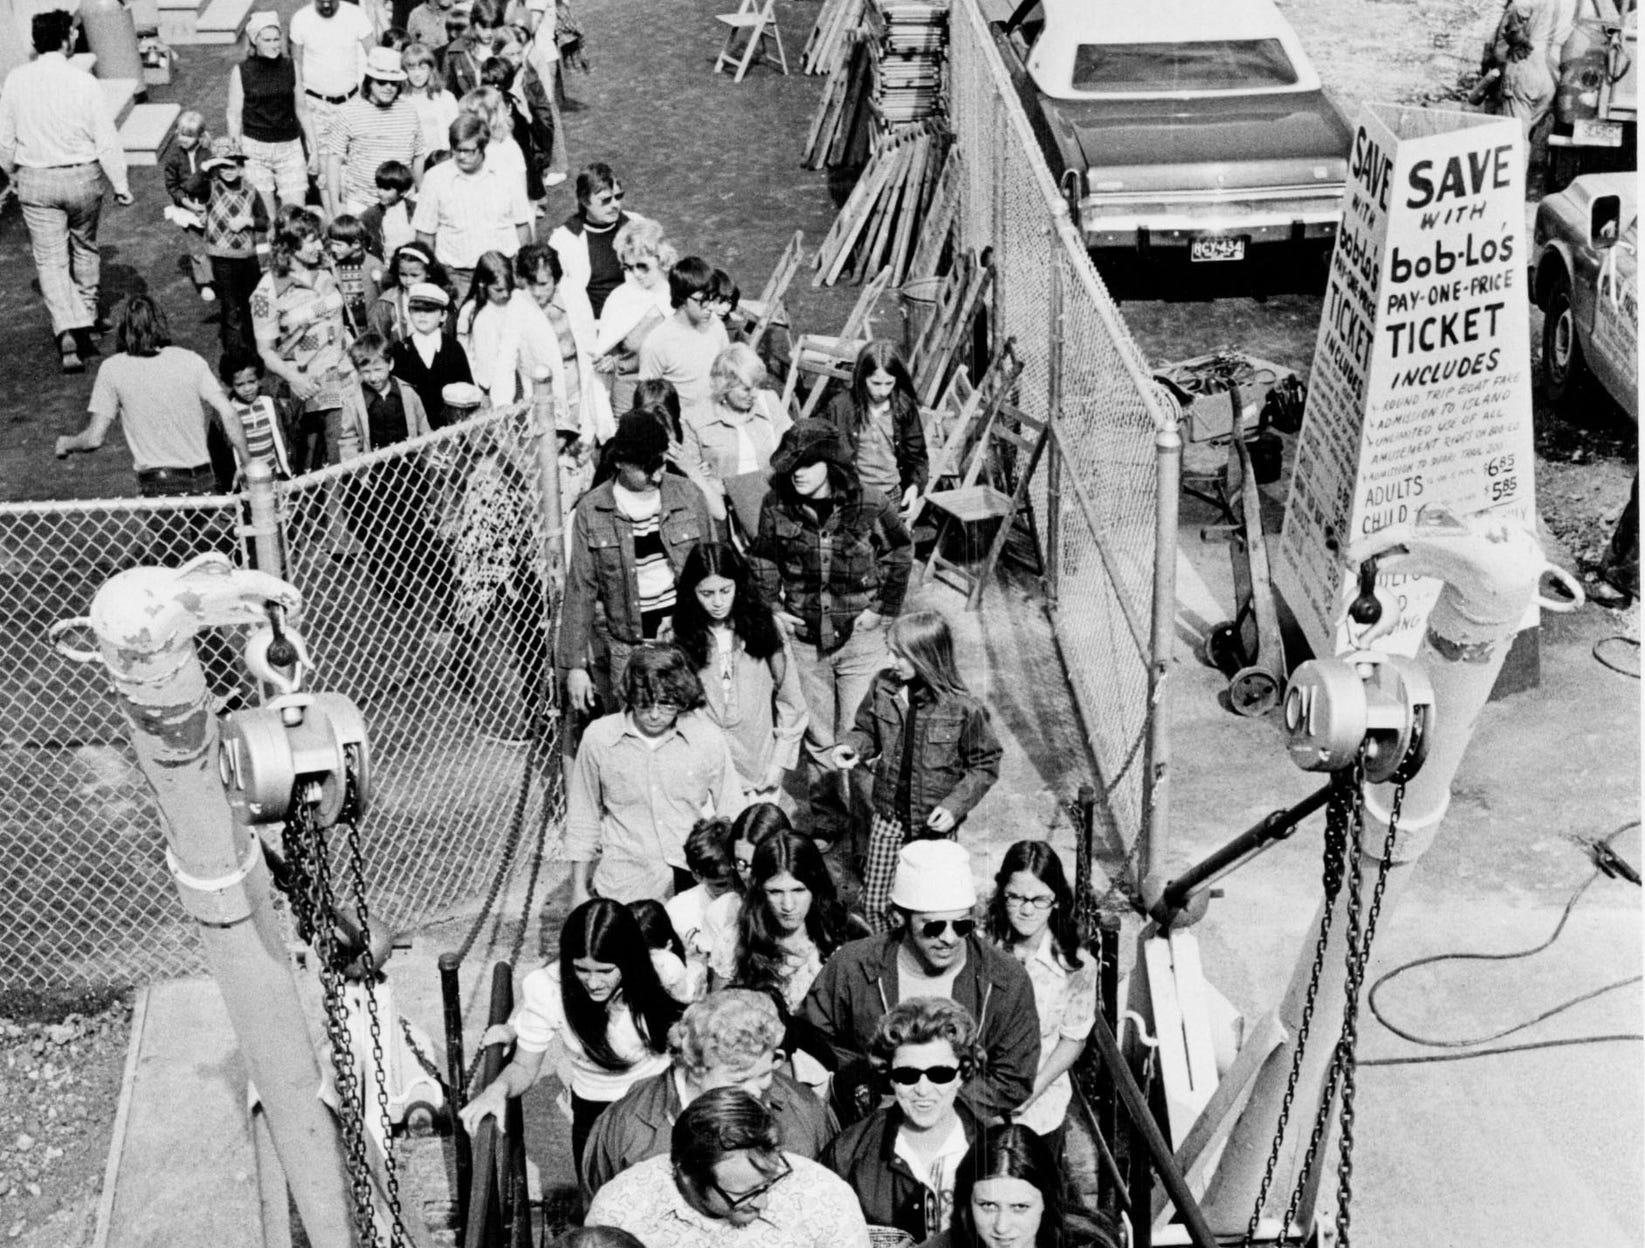 People board the Boblo boat.